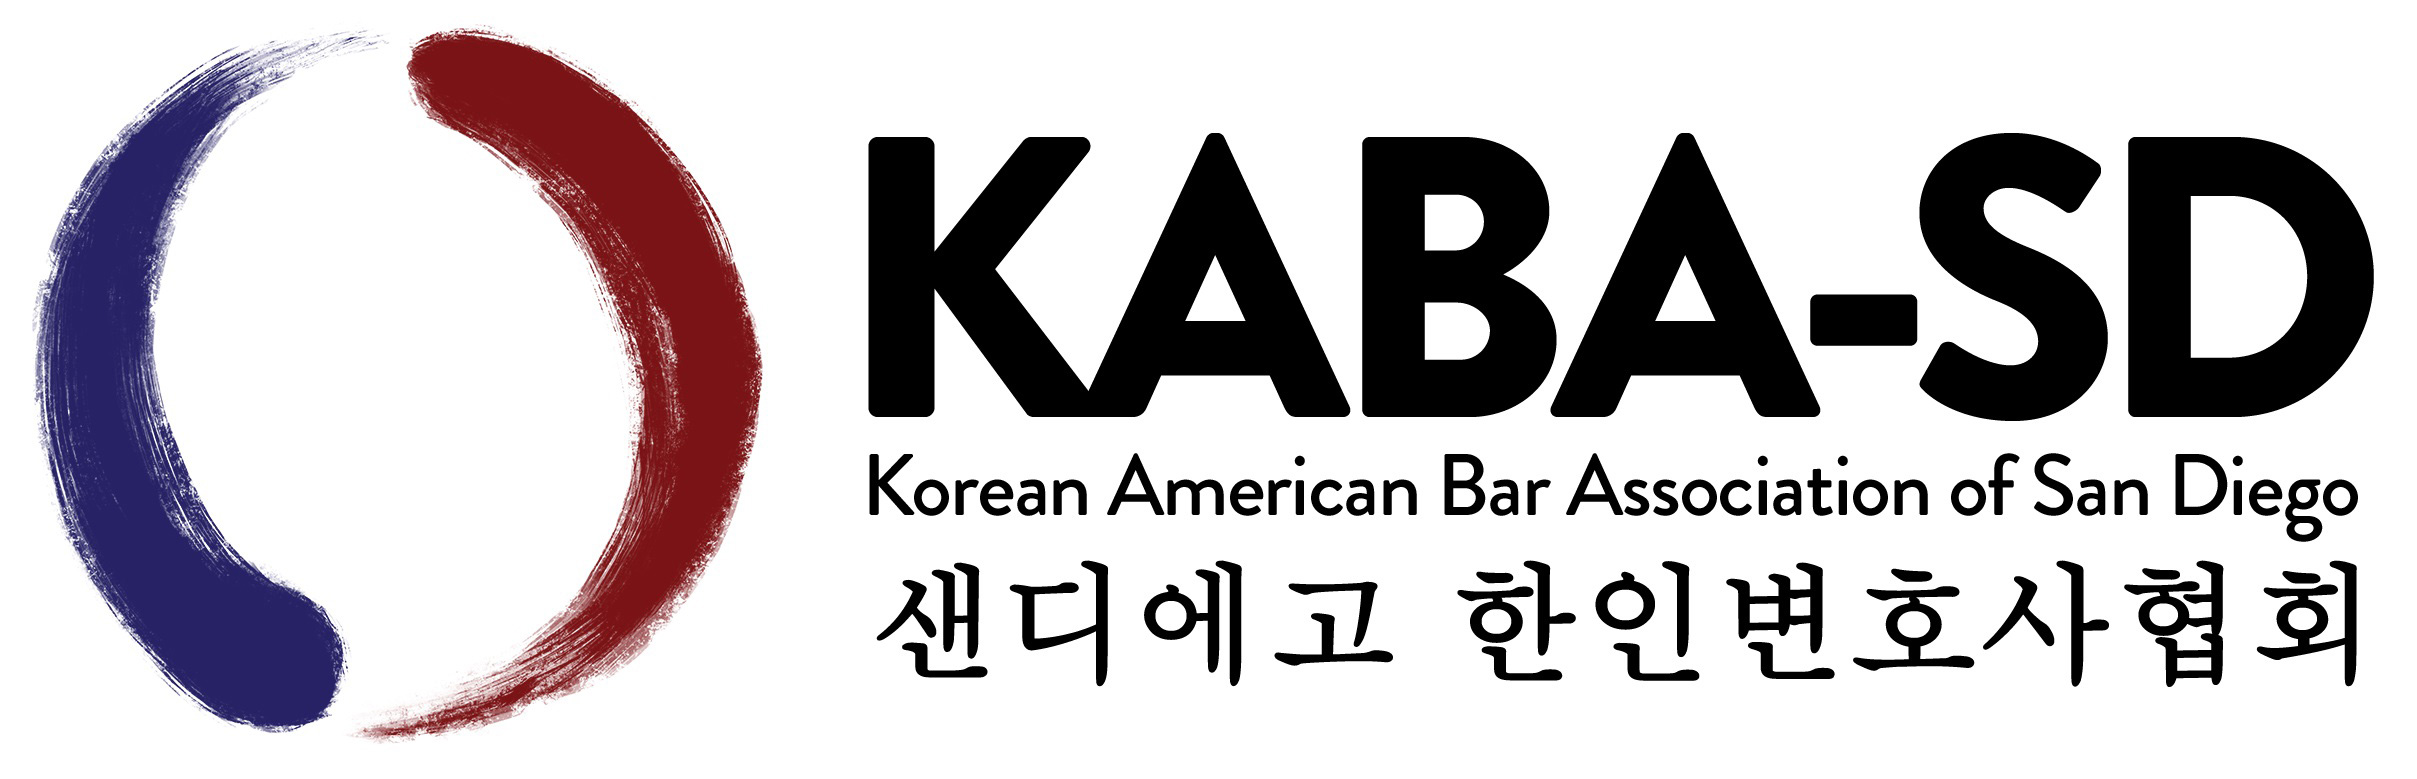 Korean American Bar Association of San Diego (KABA-SD)